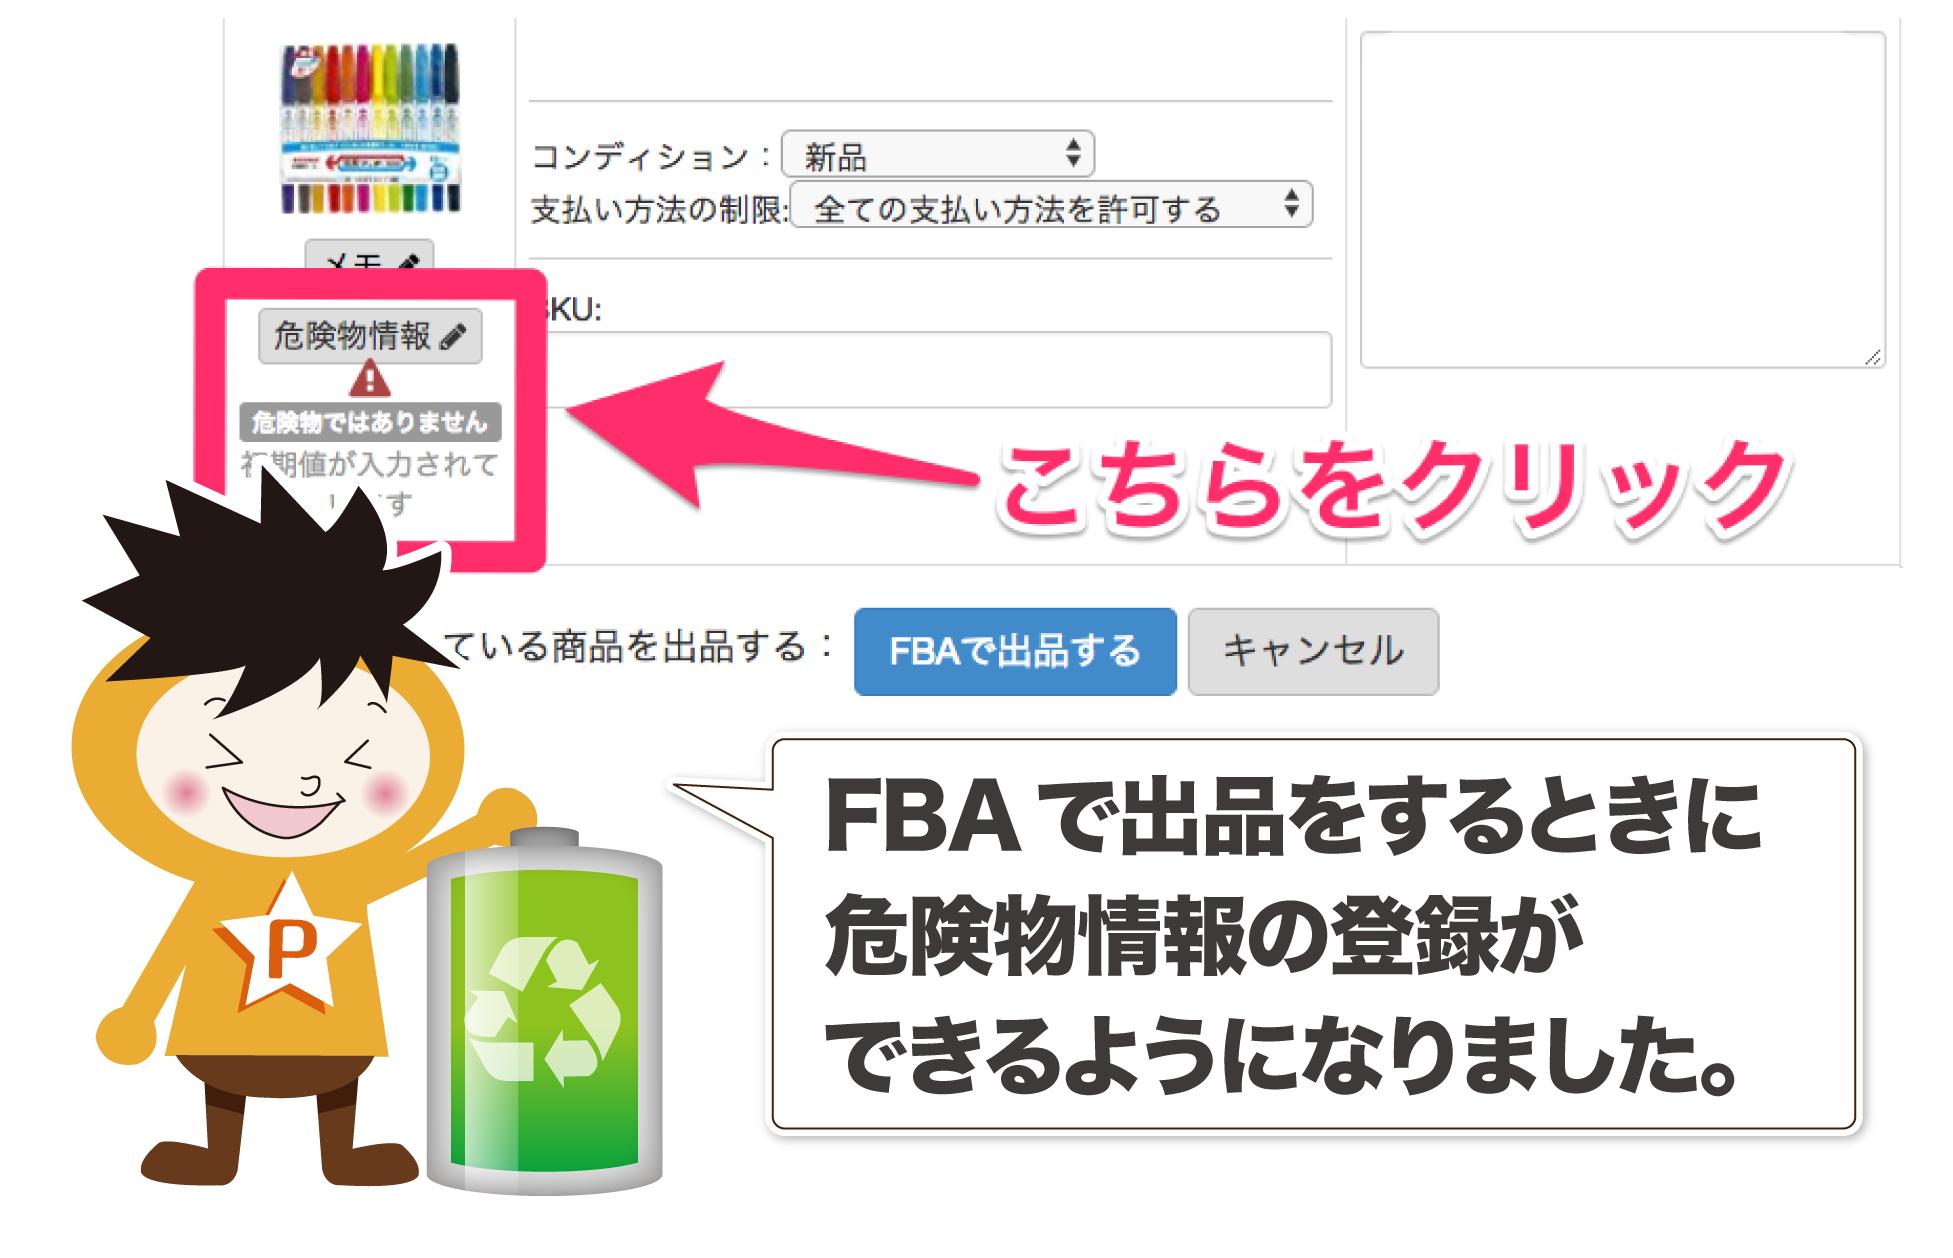 FBAで出品をする時は危険物情報...